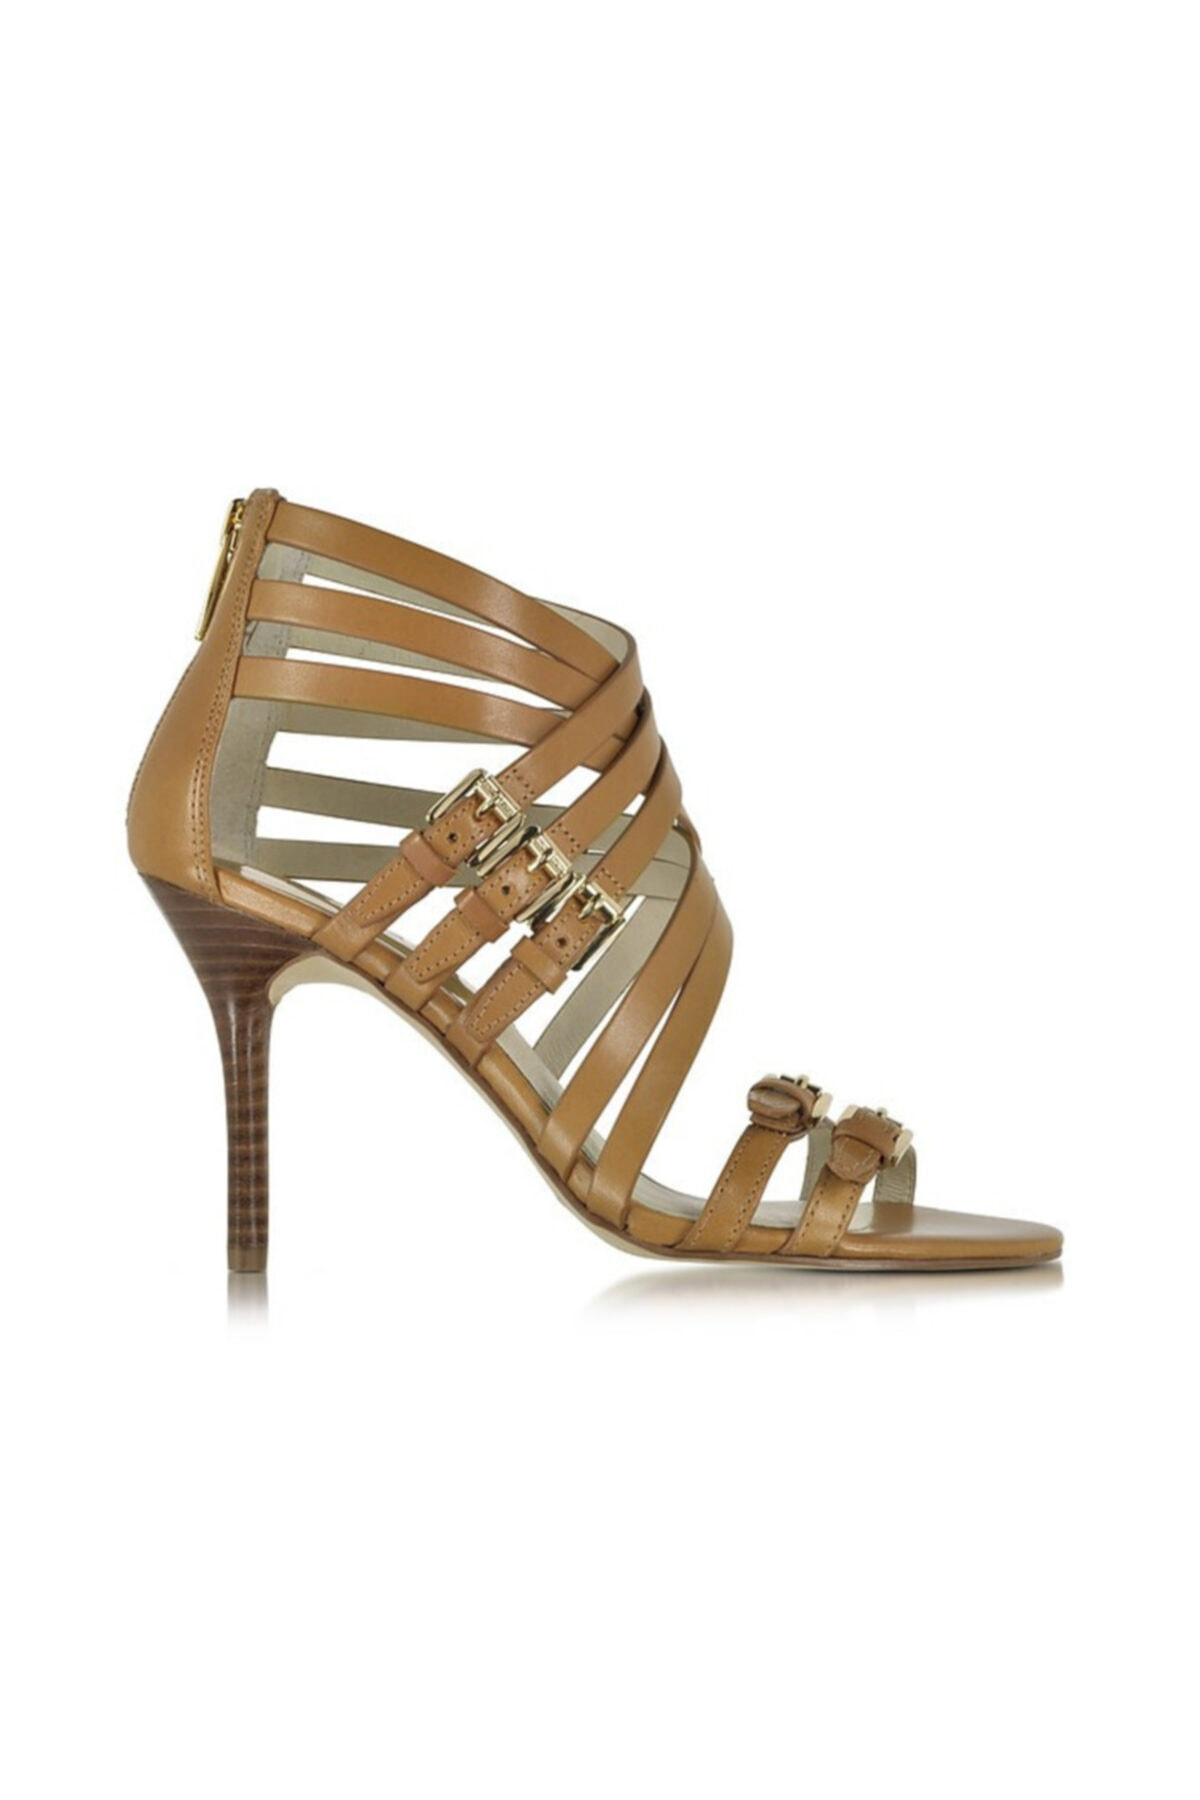 Michael Kors Ava Kadın Topuklu Sandalet Peanut 40s5avhs1l 1